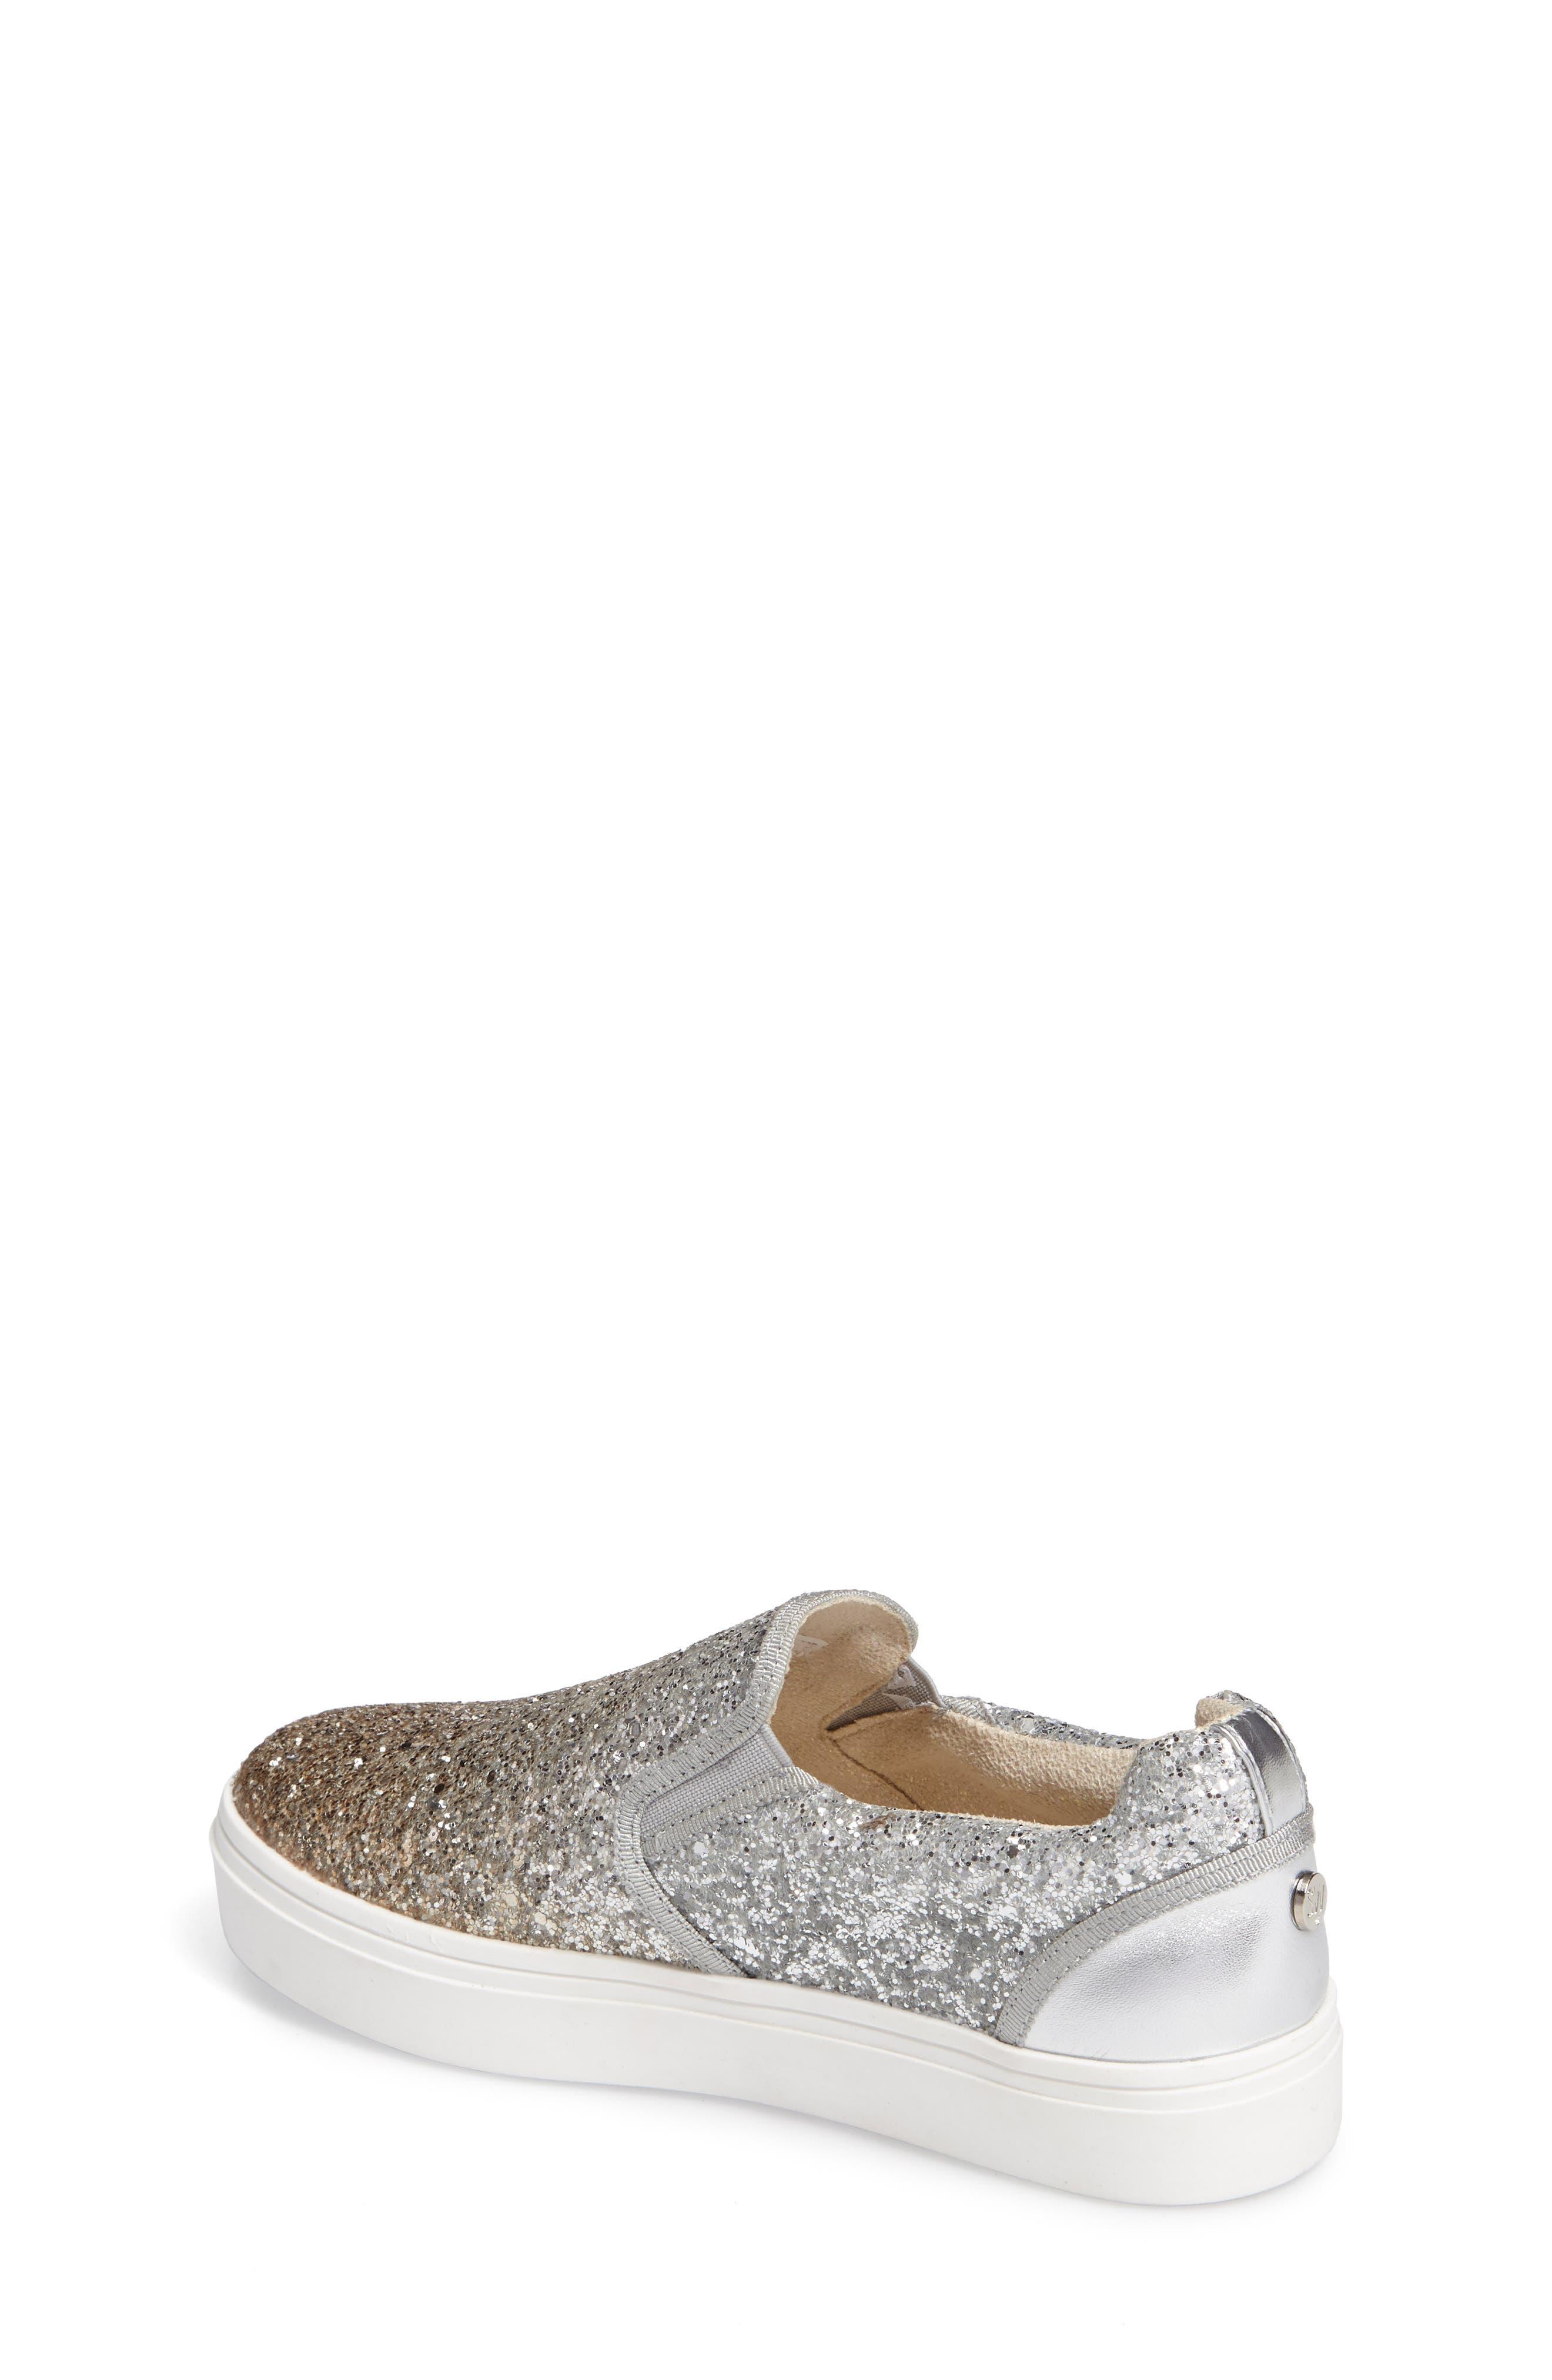 Alternate Image 2  - Stuart Weitzman Double Marcia Glitter Platform Sneaker (Toddler, Little Kid & Big Kid)